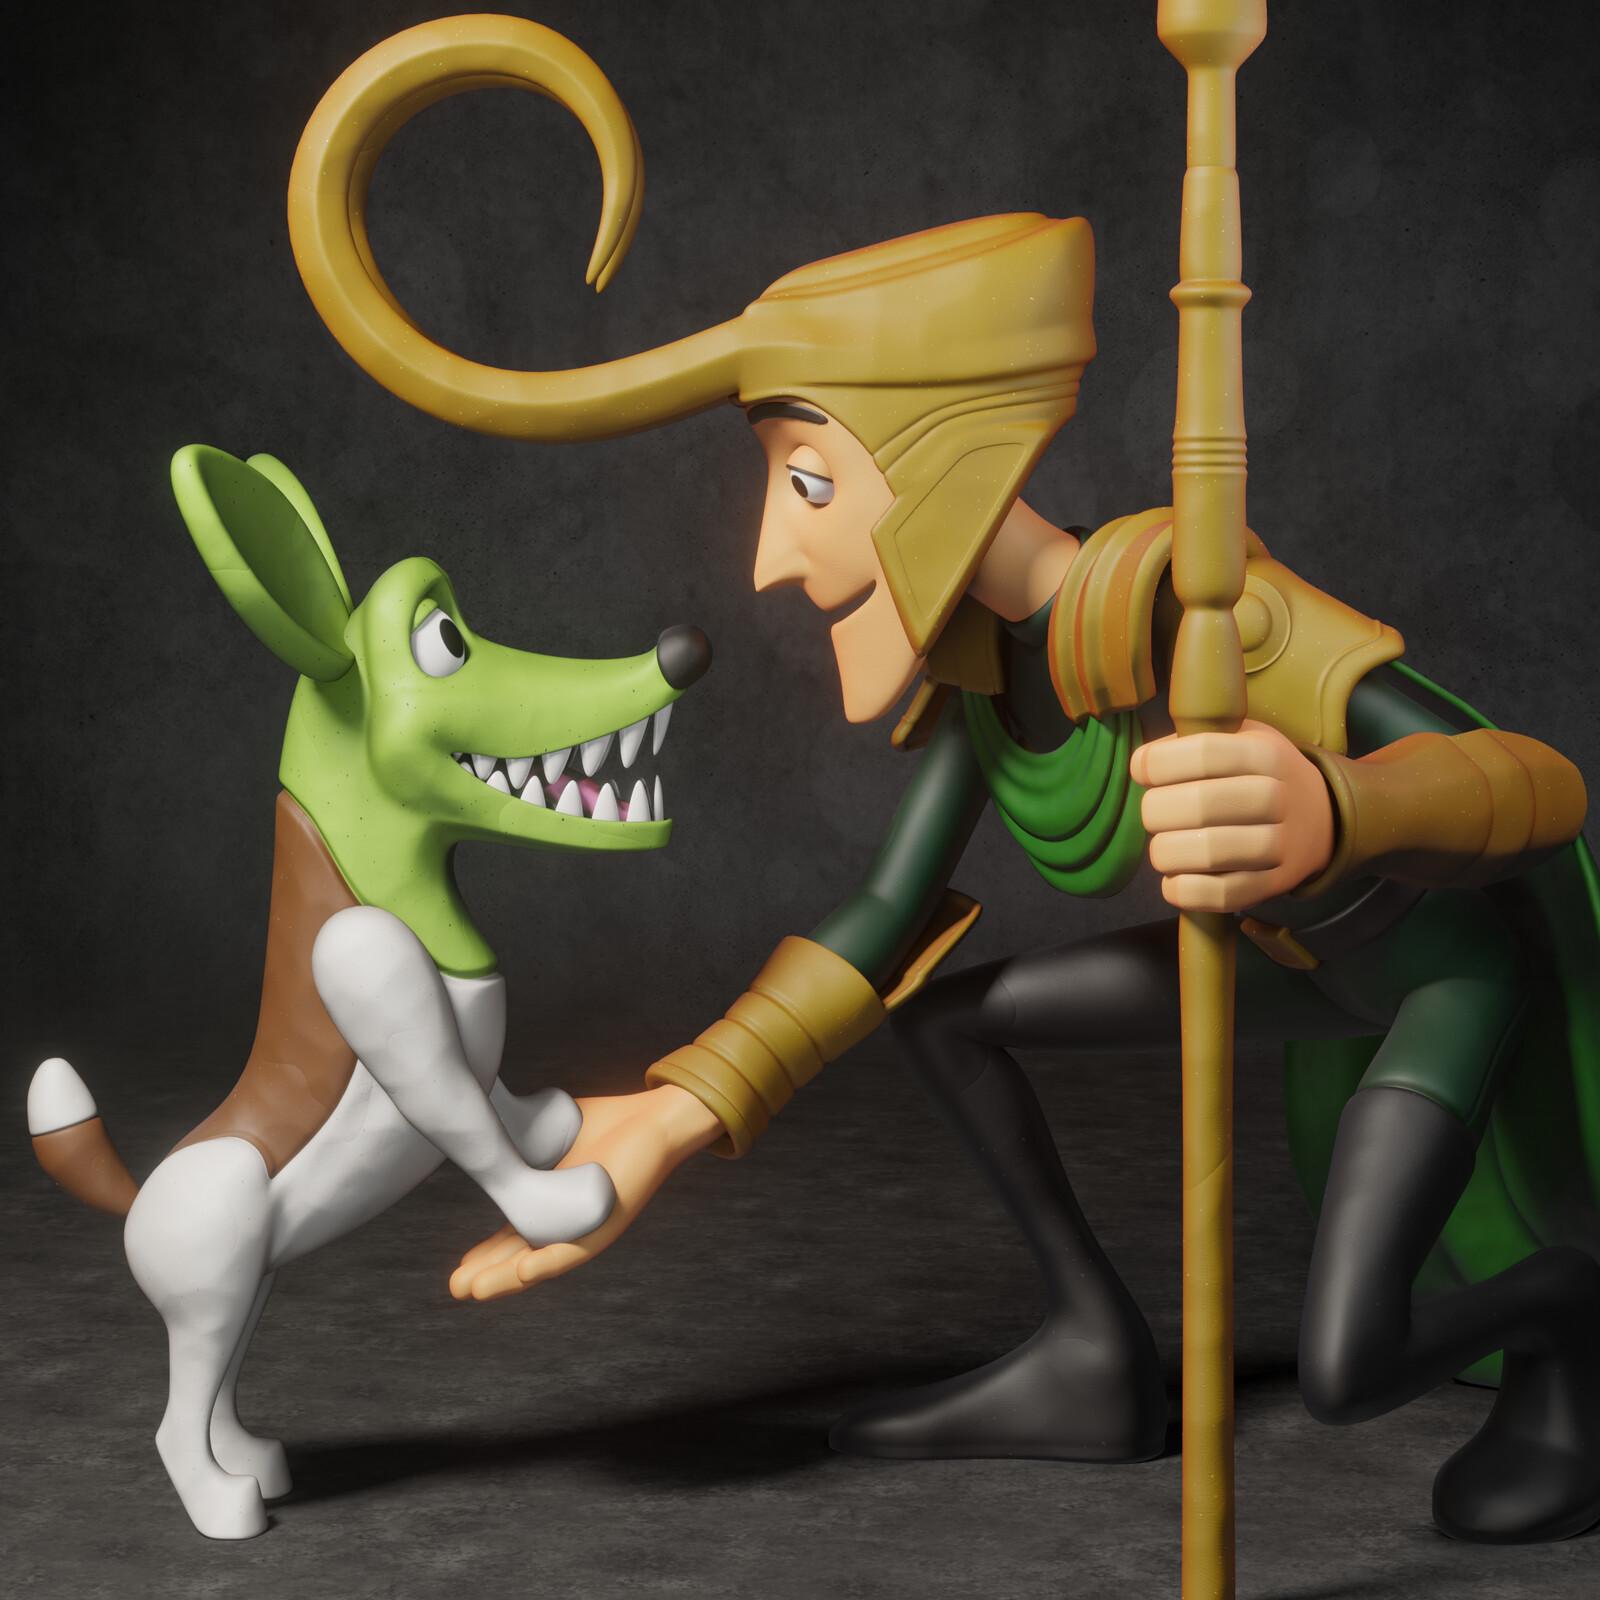 Loki (featuring Dark Horse's Milo from 'The Mask' movie)